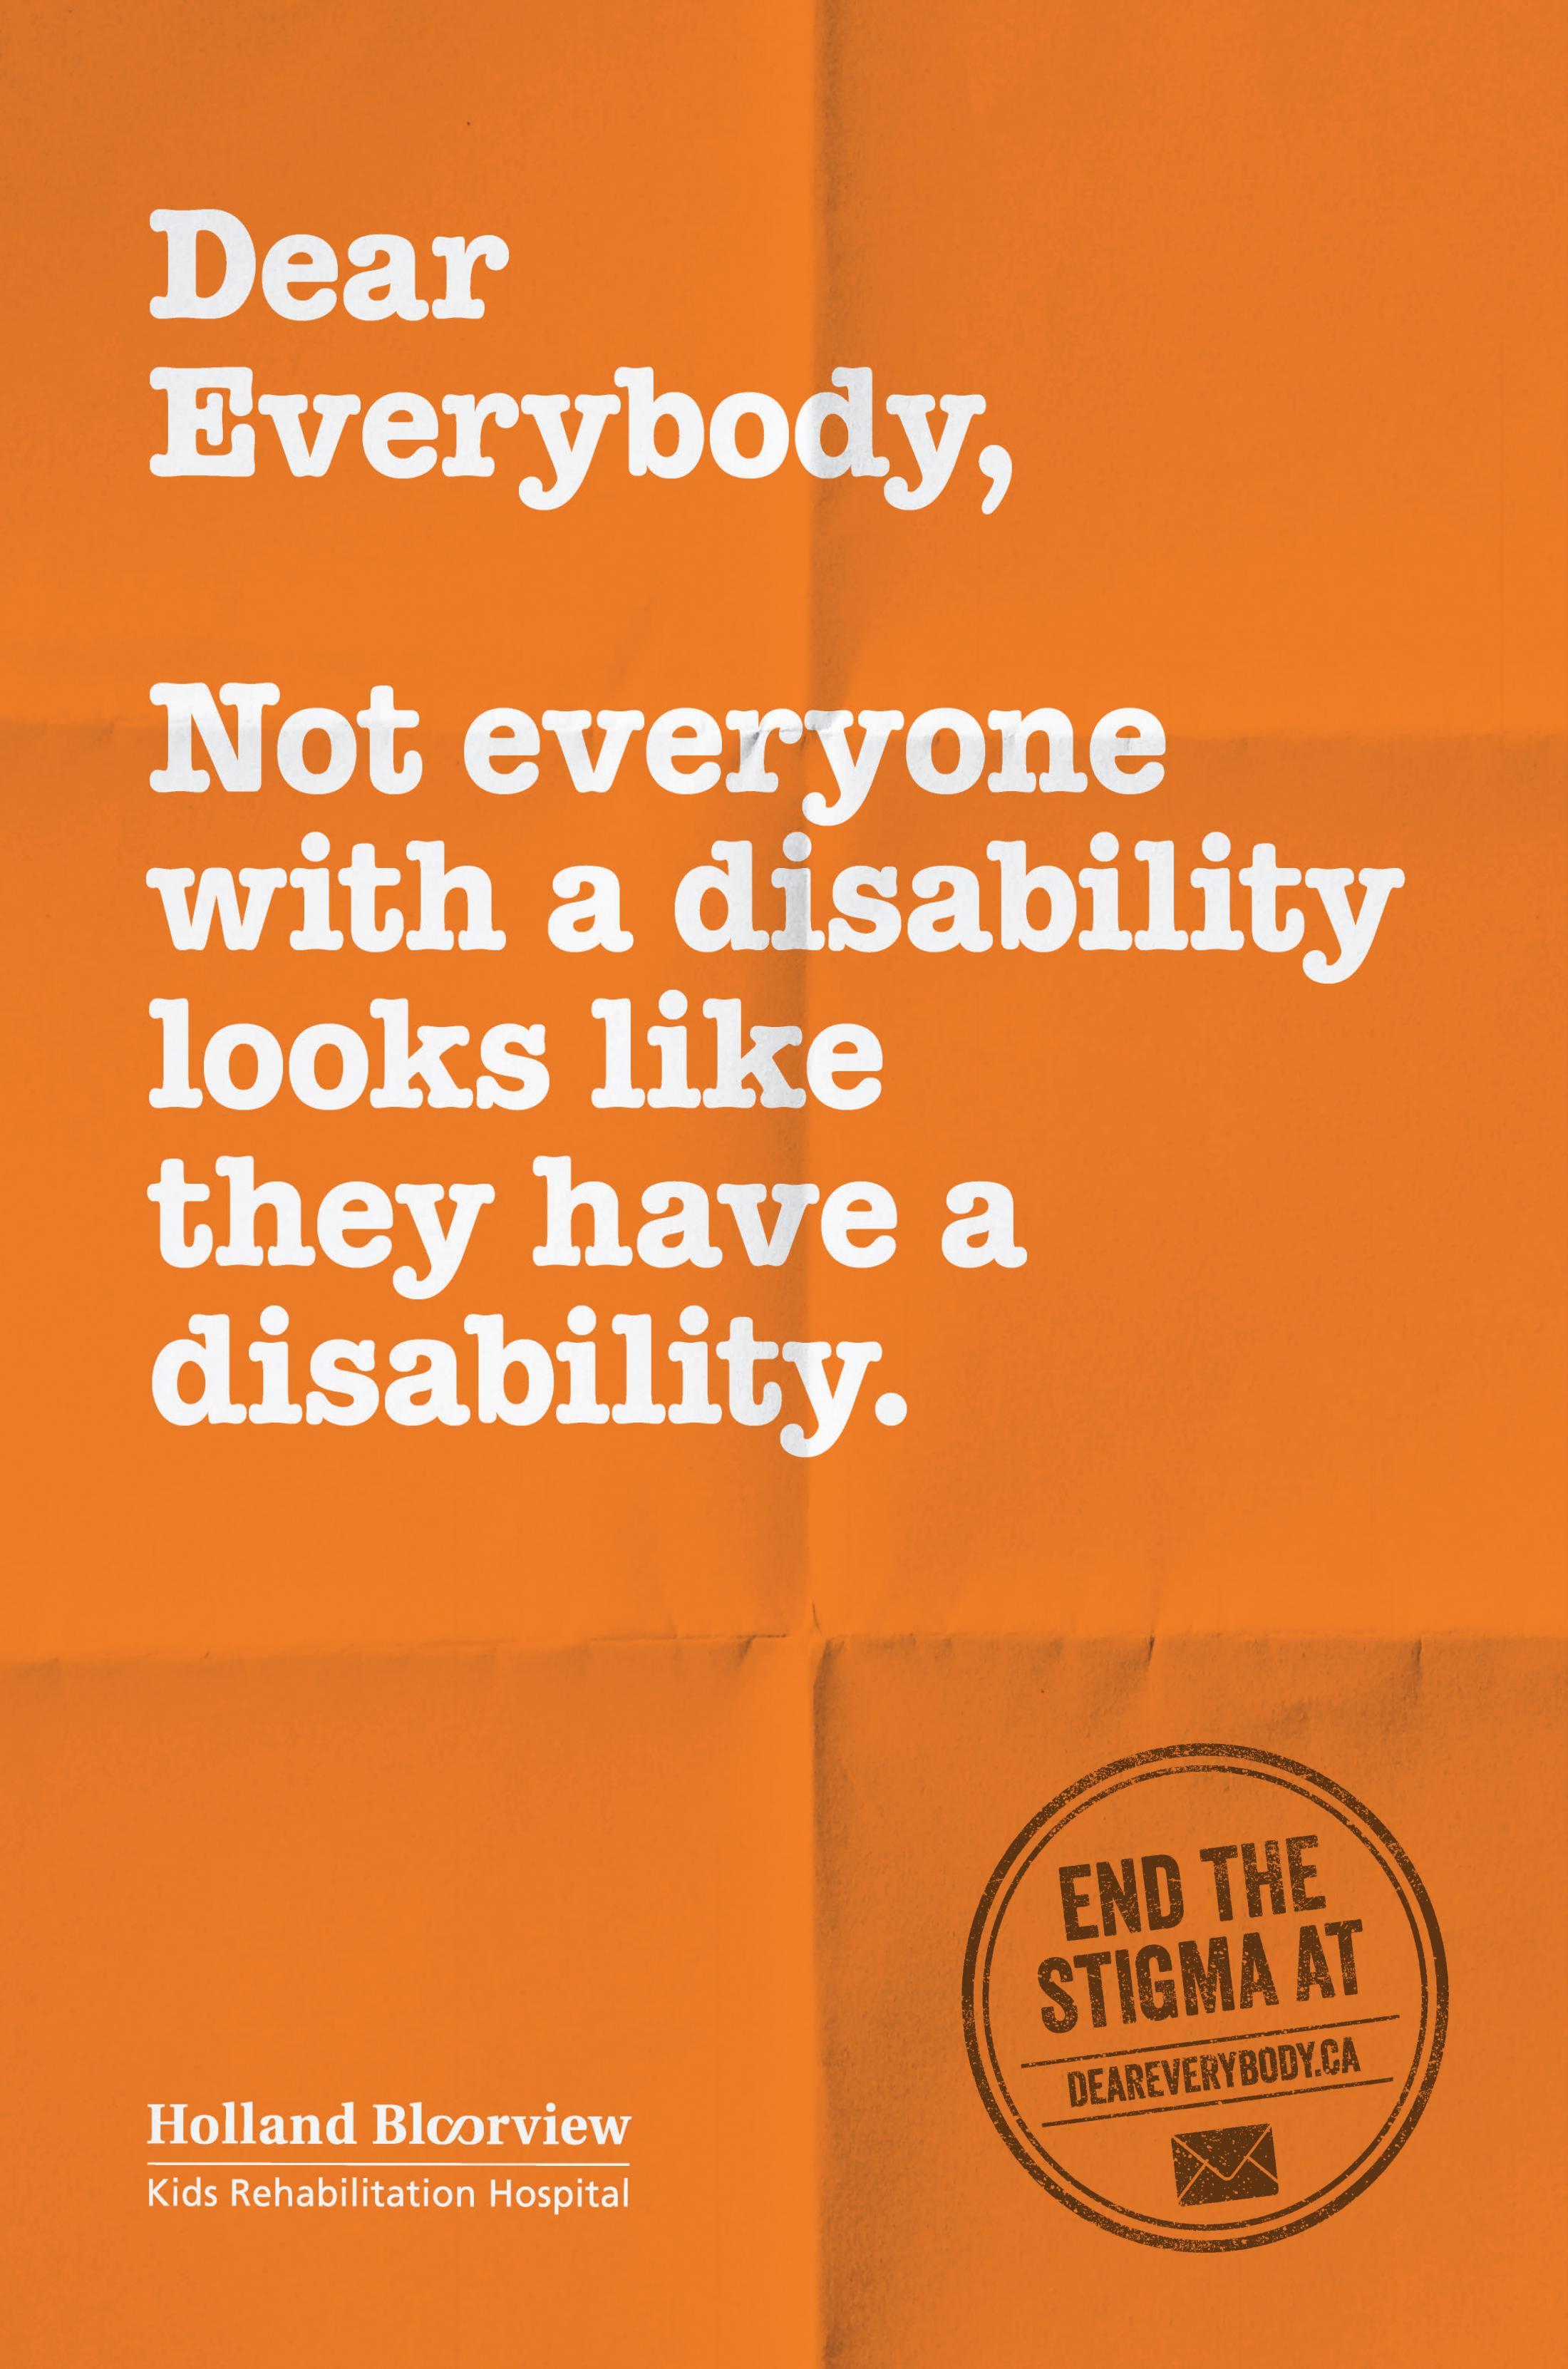 Holland Bloorview Kids Rehabilitation Outdoor Ad - Dear Everybody, 6